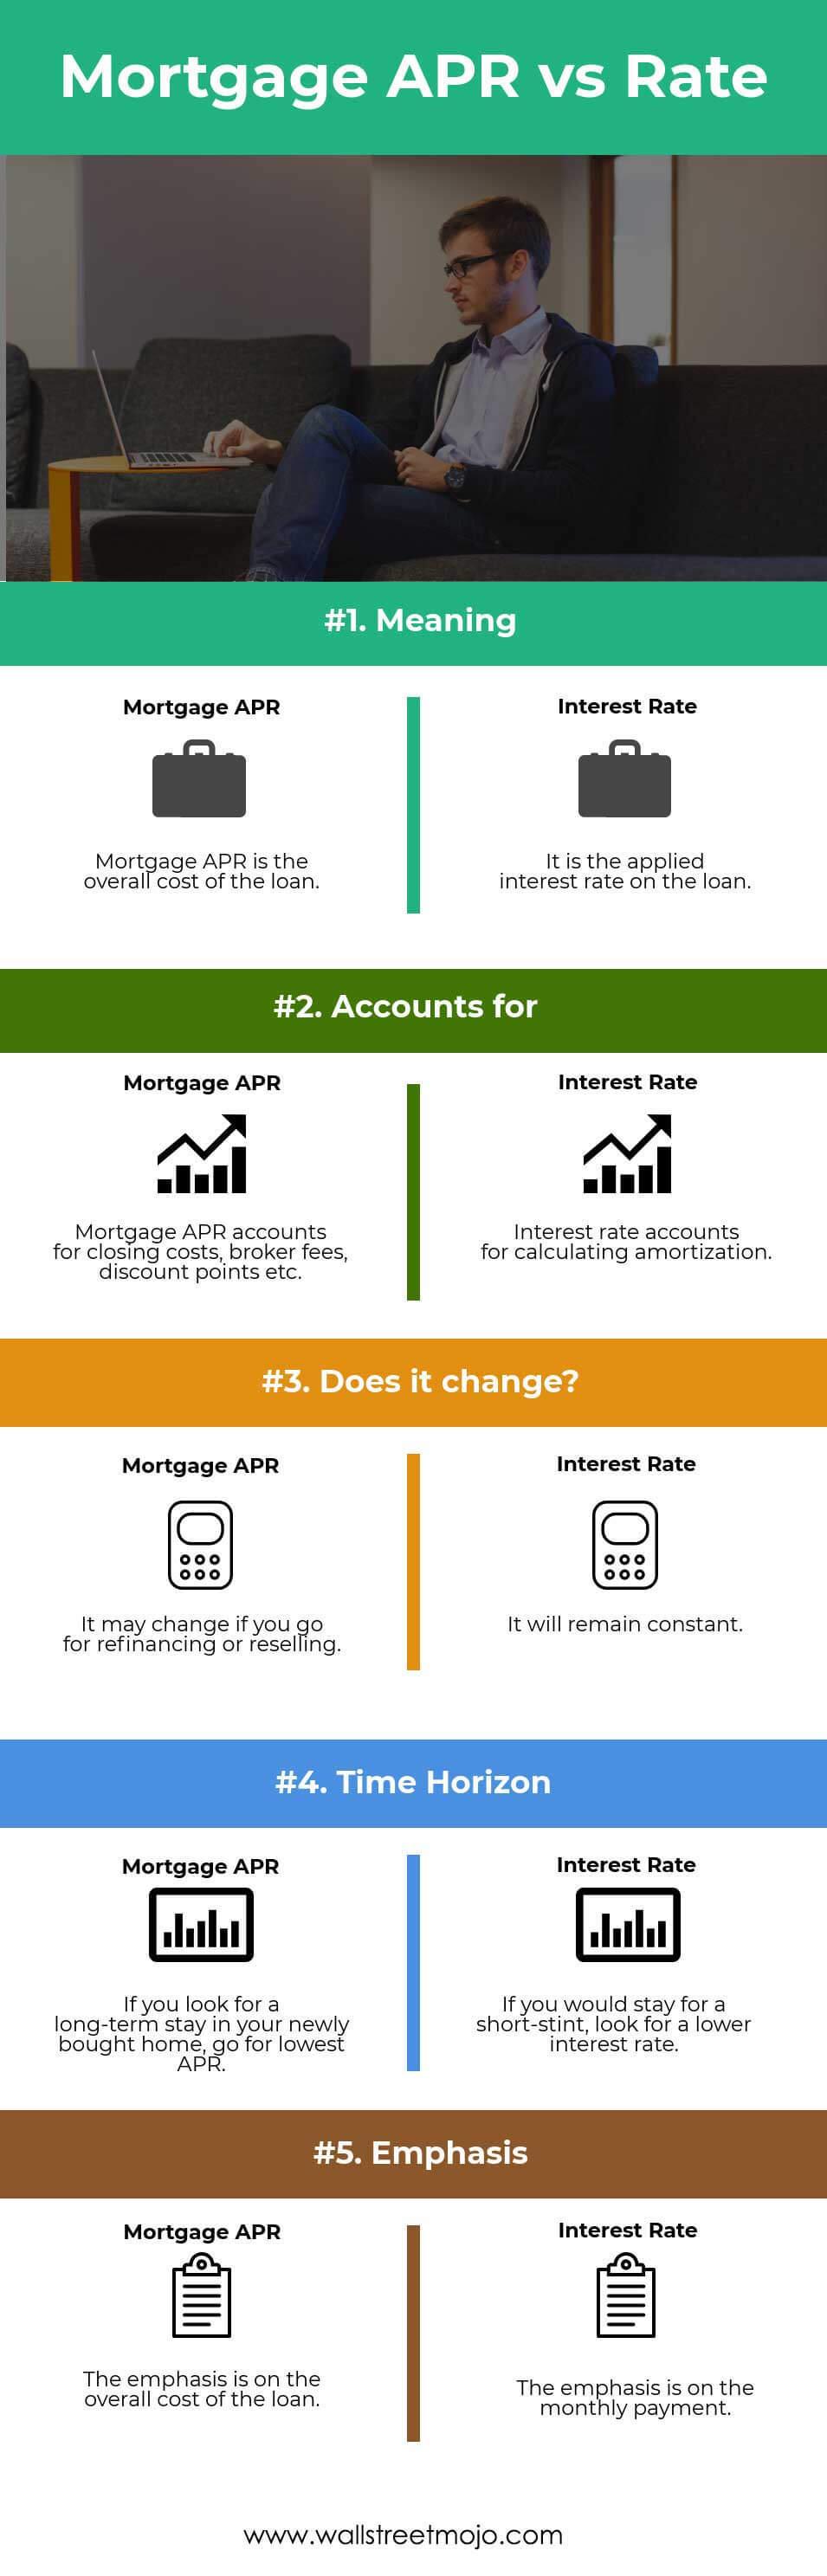 Mortgage-APR-vs-Rate